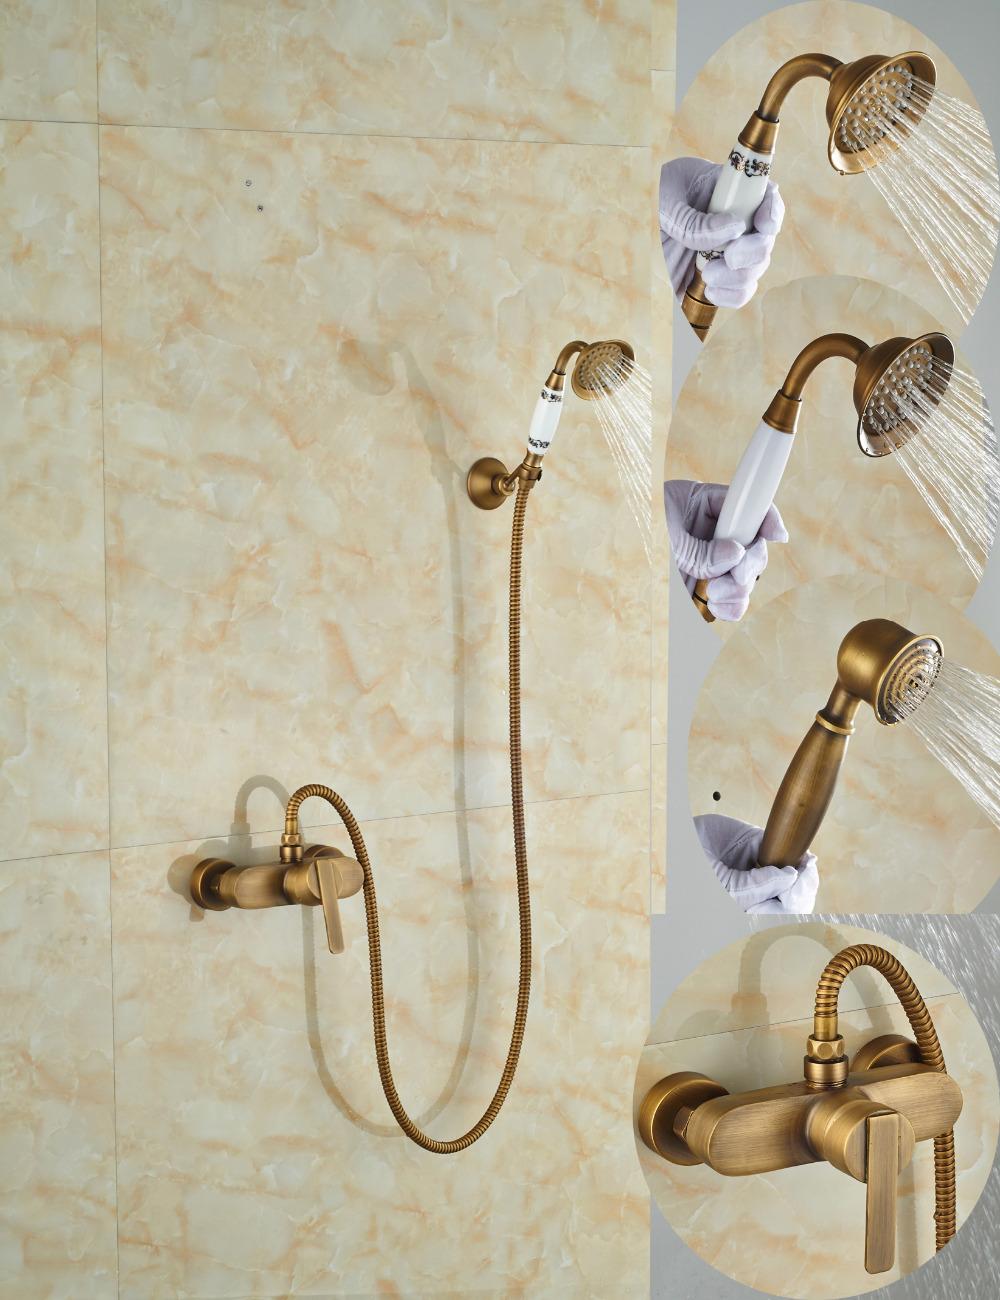 Фотография Wholesale And Retail Promotion Single Handle Antique Brass Bathroom Tub Faucet Valve Mixer Tap W/ Hand Shower Sprayer